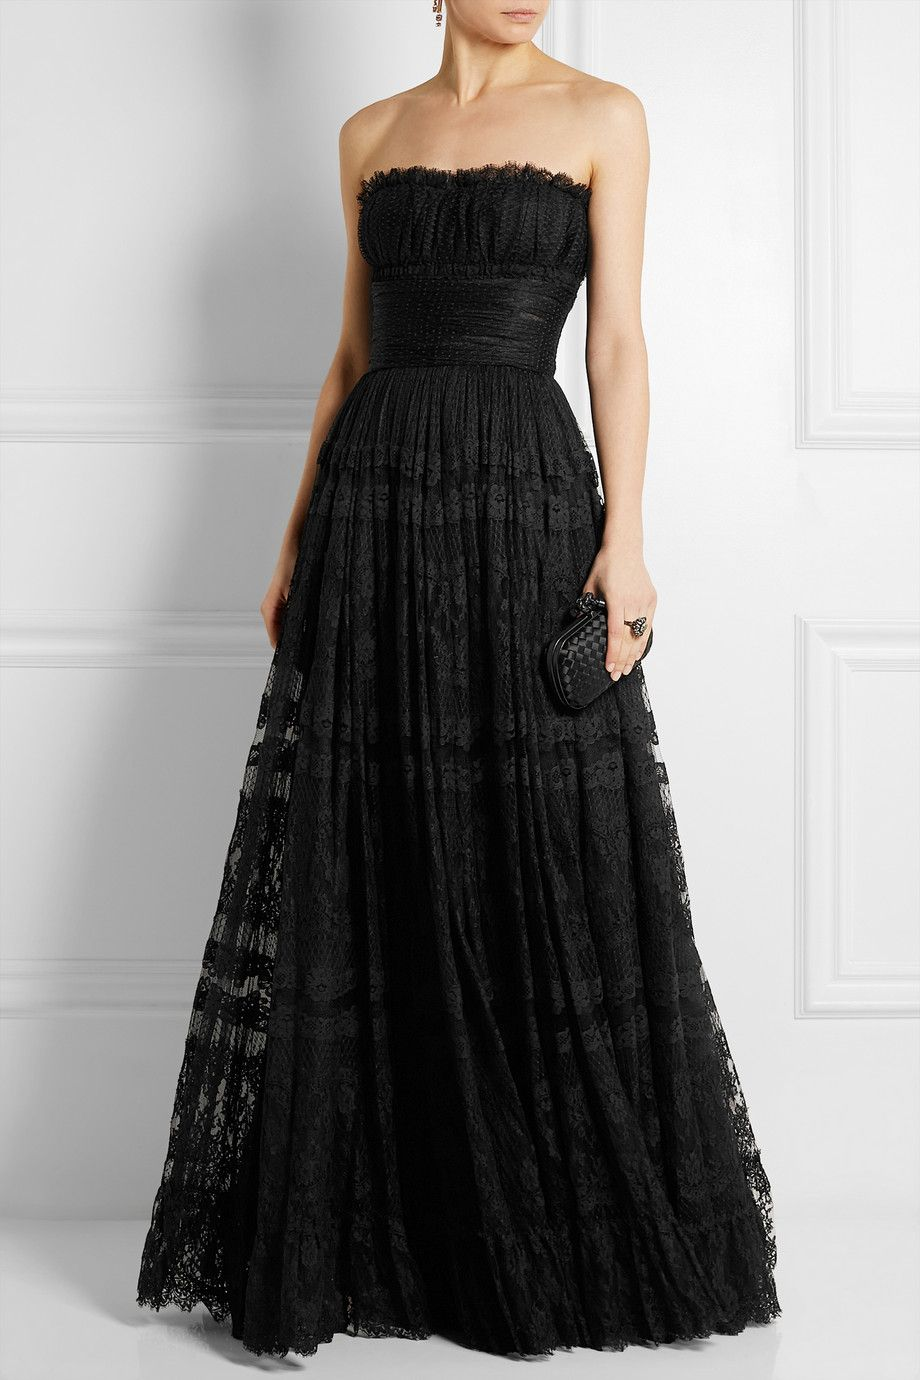 Dolce & Gabbana  Moda para mujer, Vestidos, Ropa